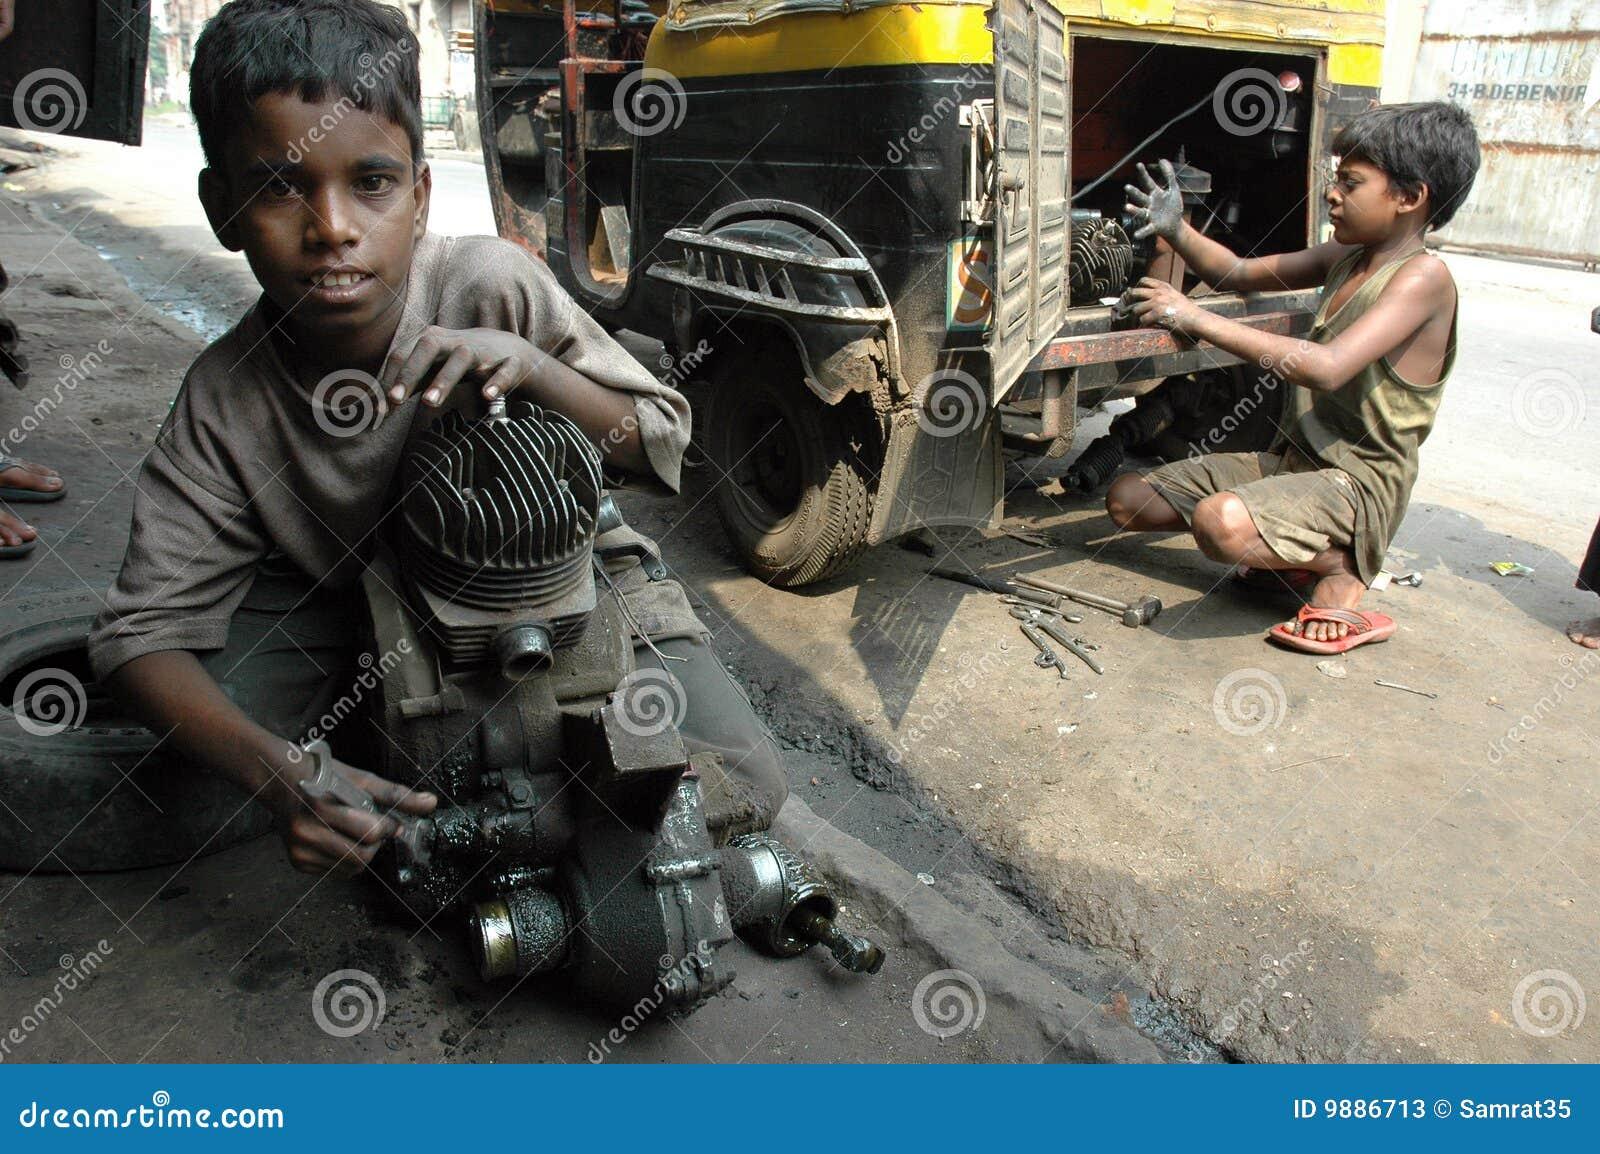 travail de l 39 inde d 39 enfant photo stock ditorial image du indien 9886713. Black Bedroom Furniture Sets. Home Design Ideas